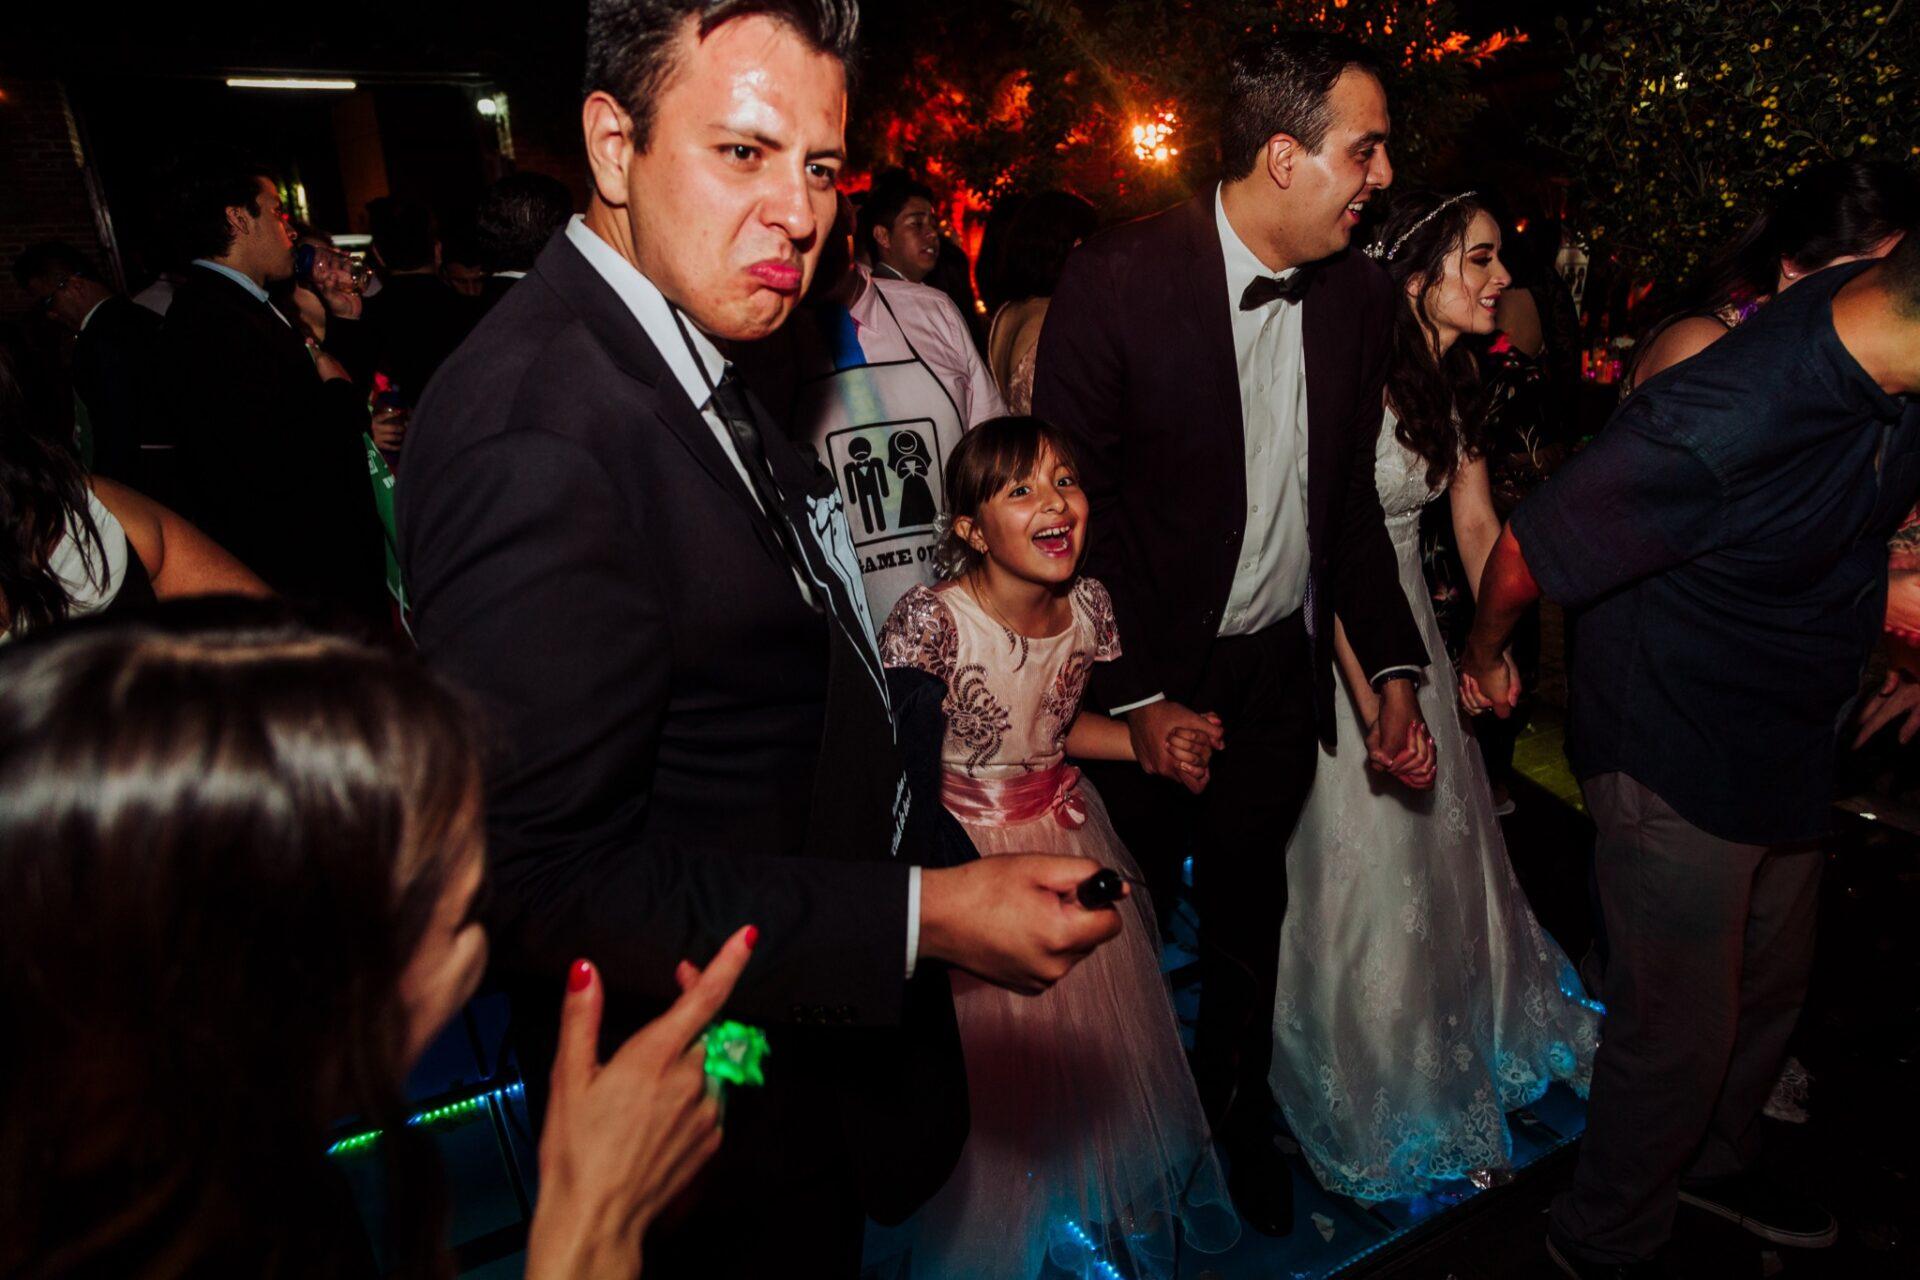 javier_noriega_fotografo_bodas_teul_zacatecas_wedding_photographer50